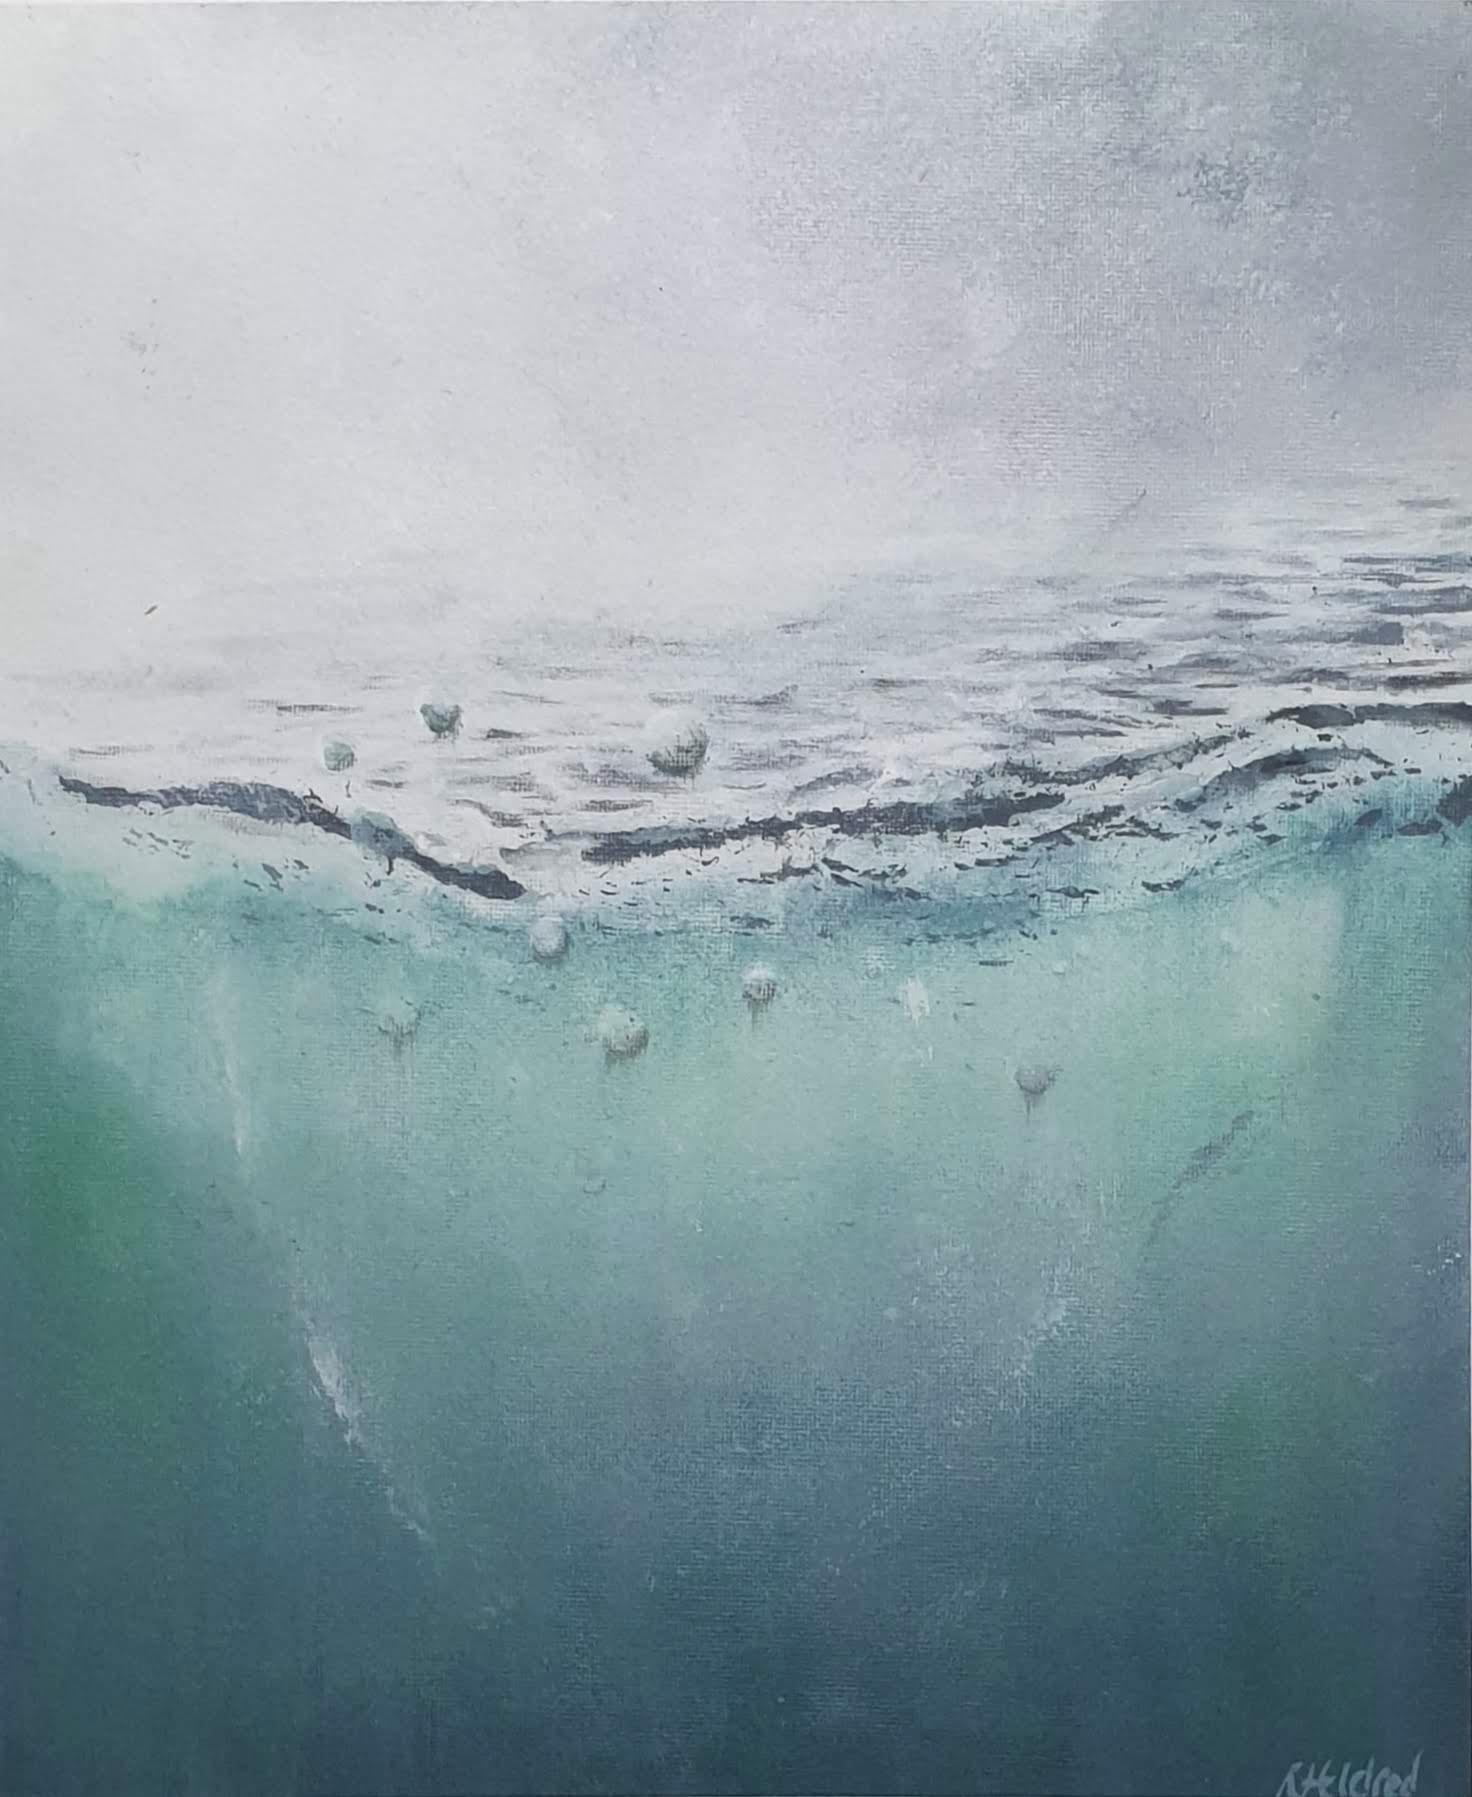 Sea mist - 25cm x 30cm£45